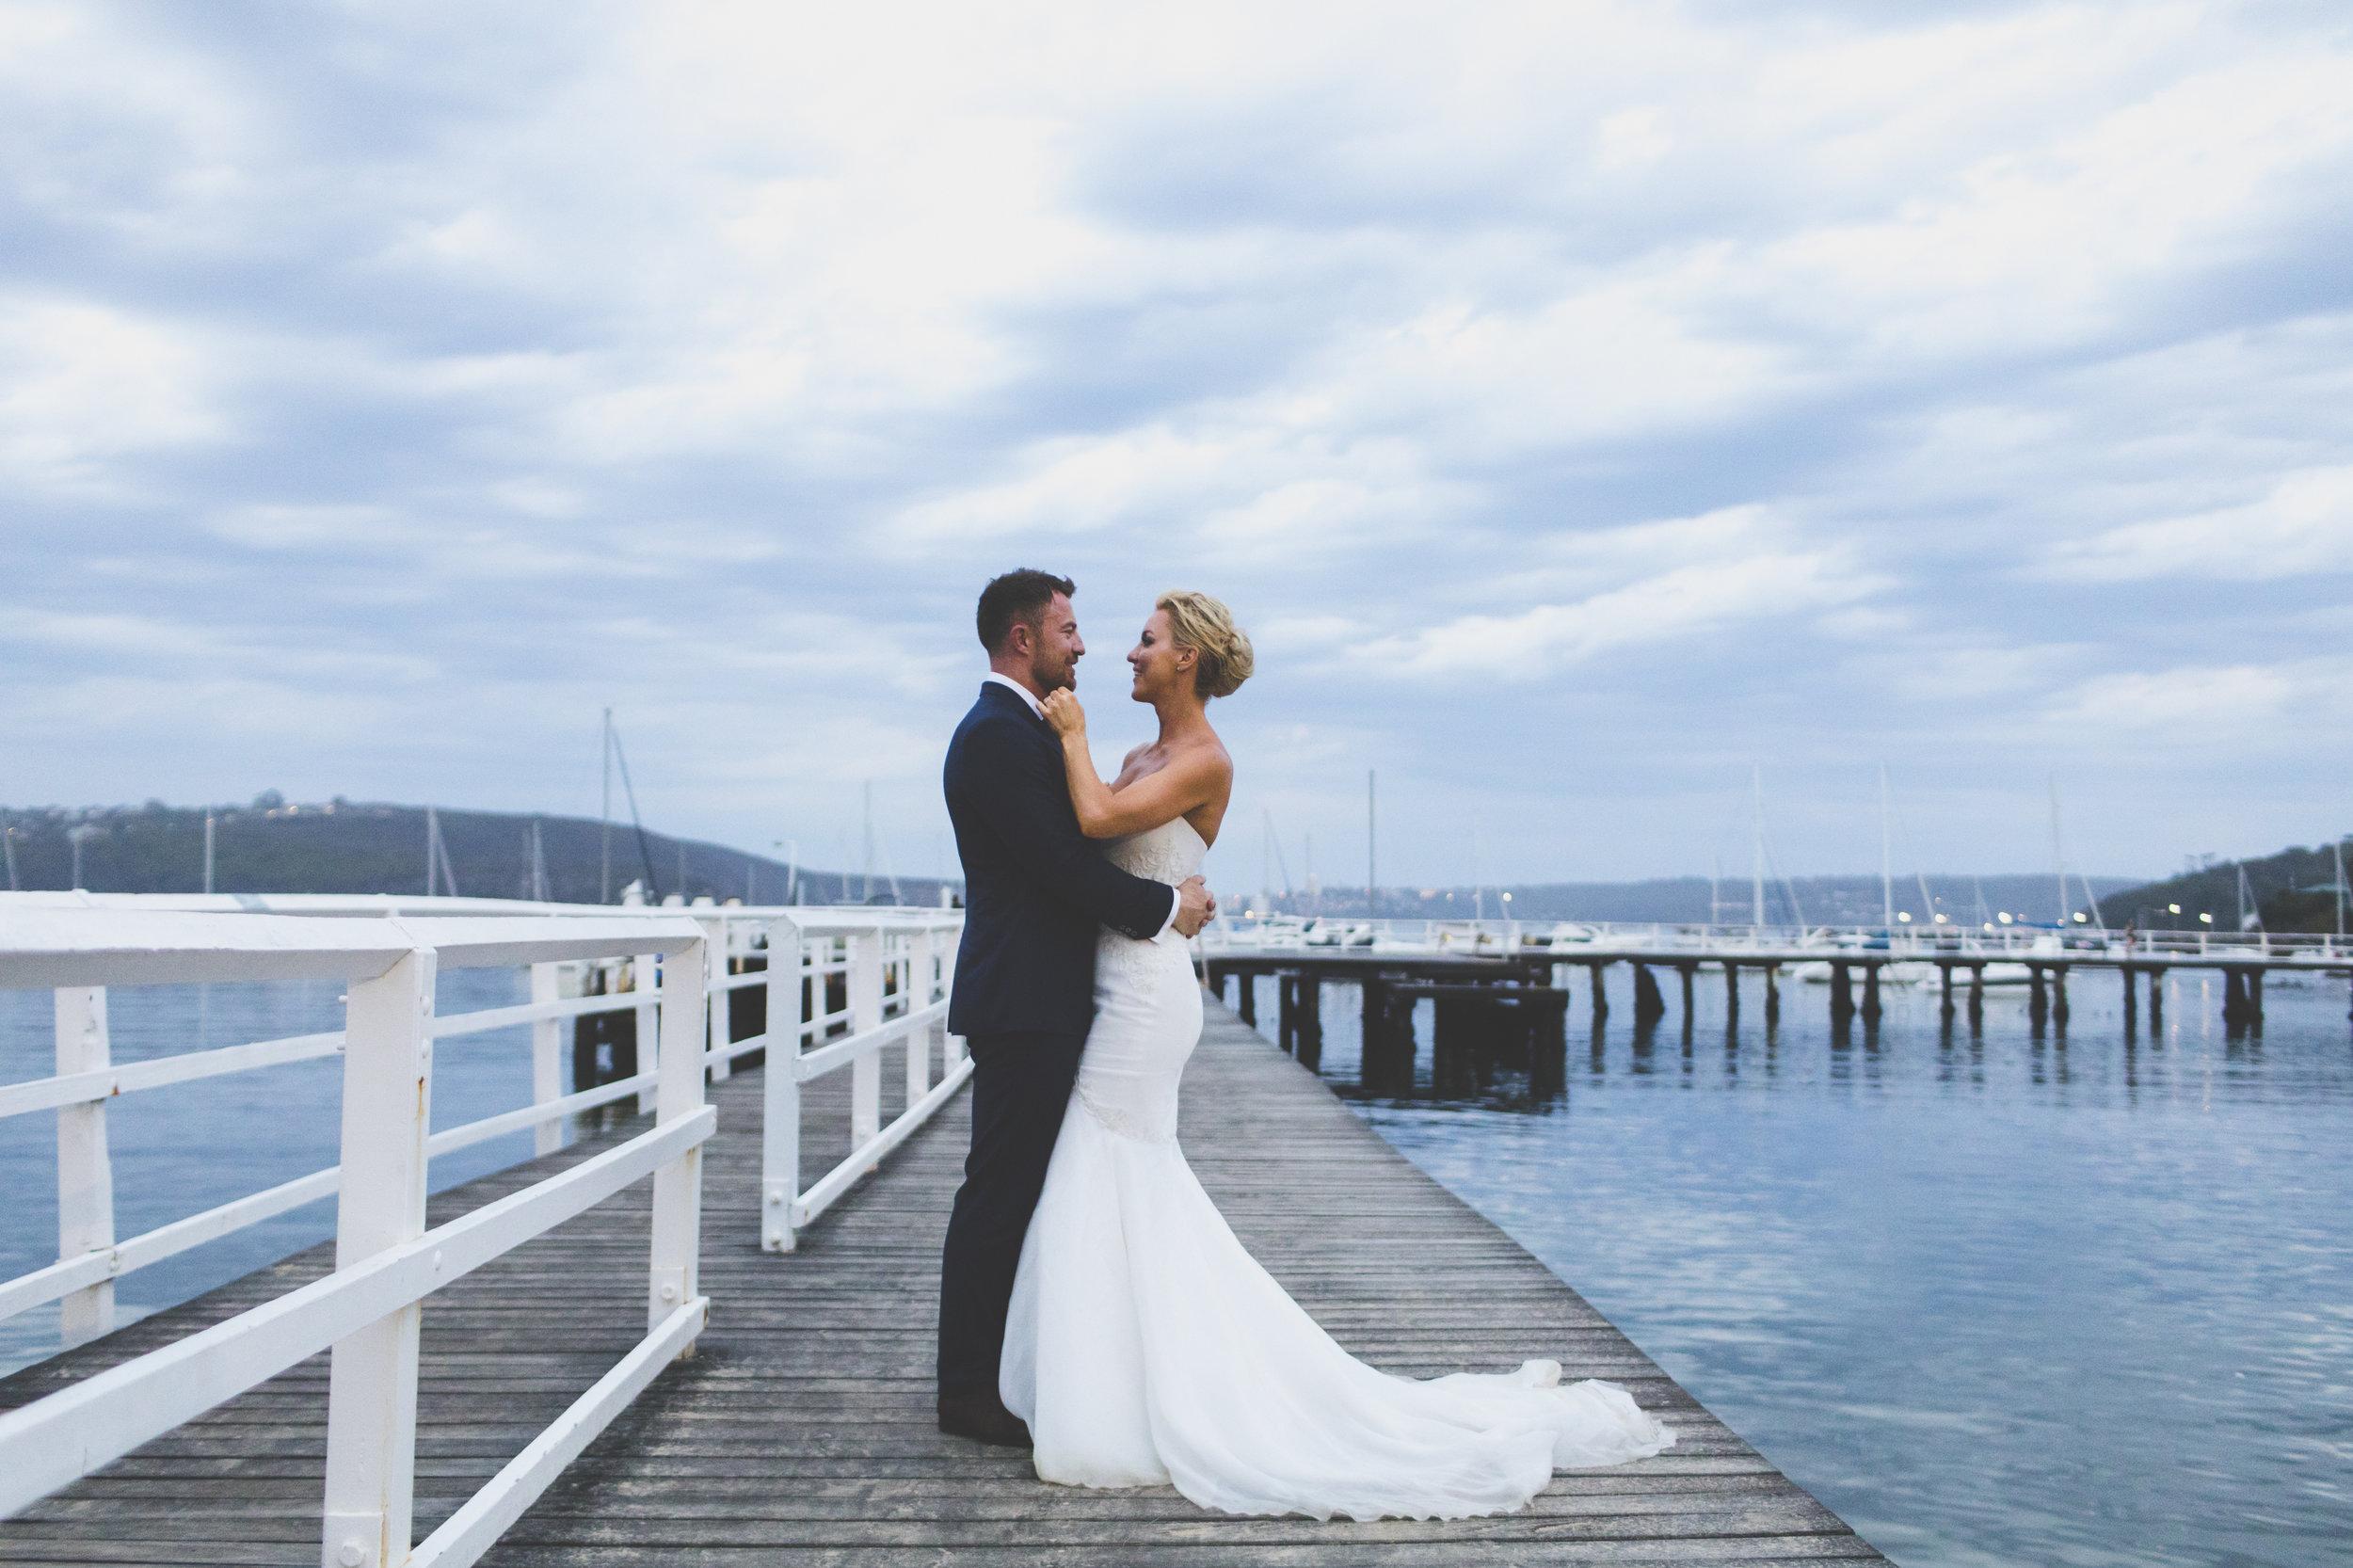 Bride and Groom Wedding Photos at The Public Dining Room Balmoral Sydney Wedding Reception